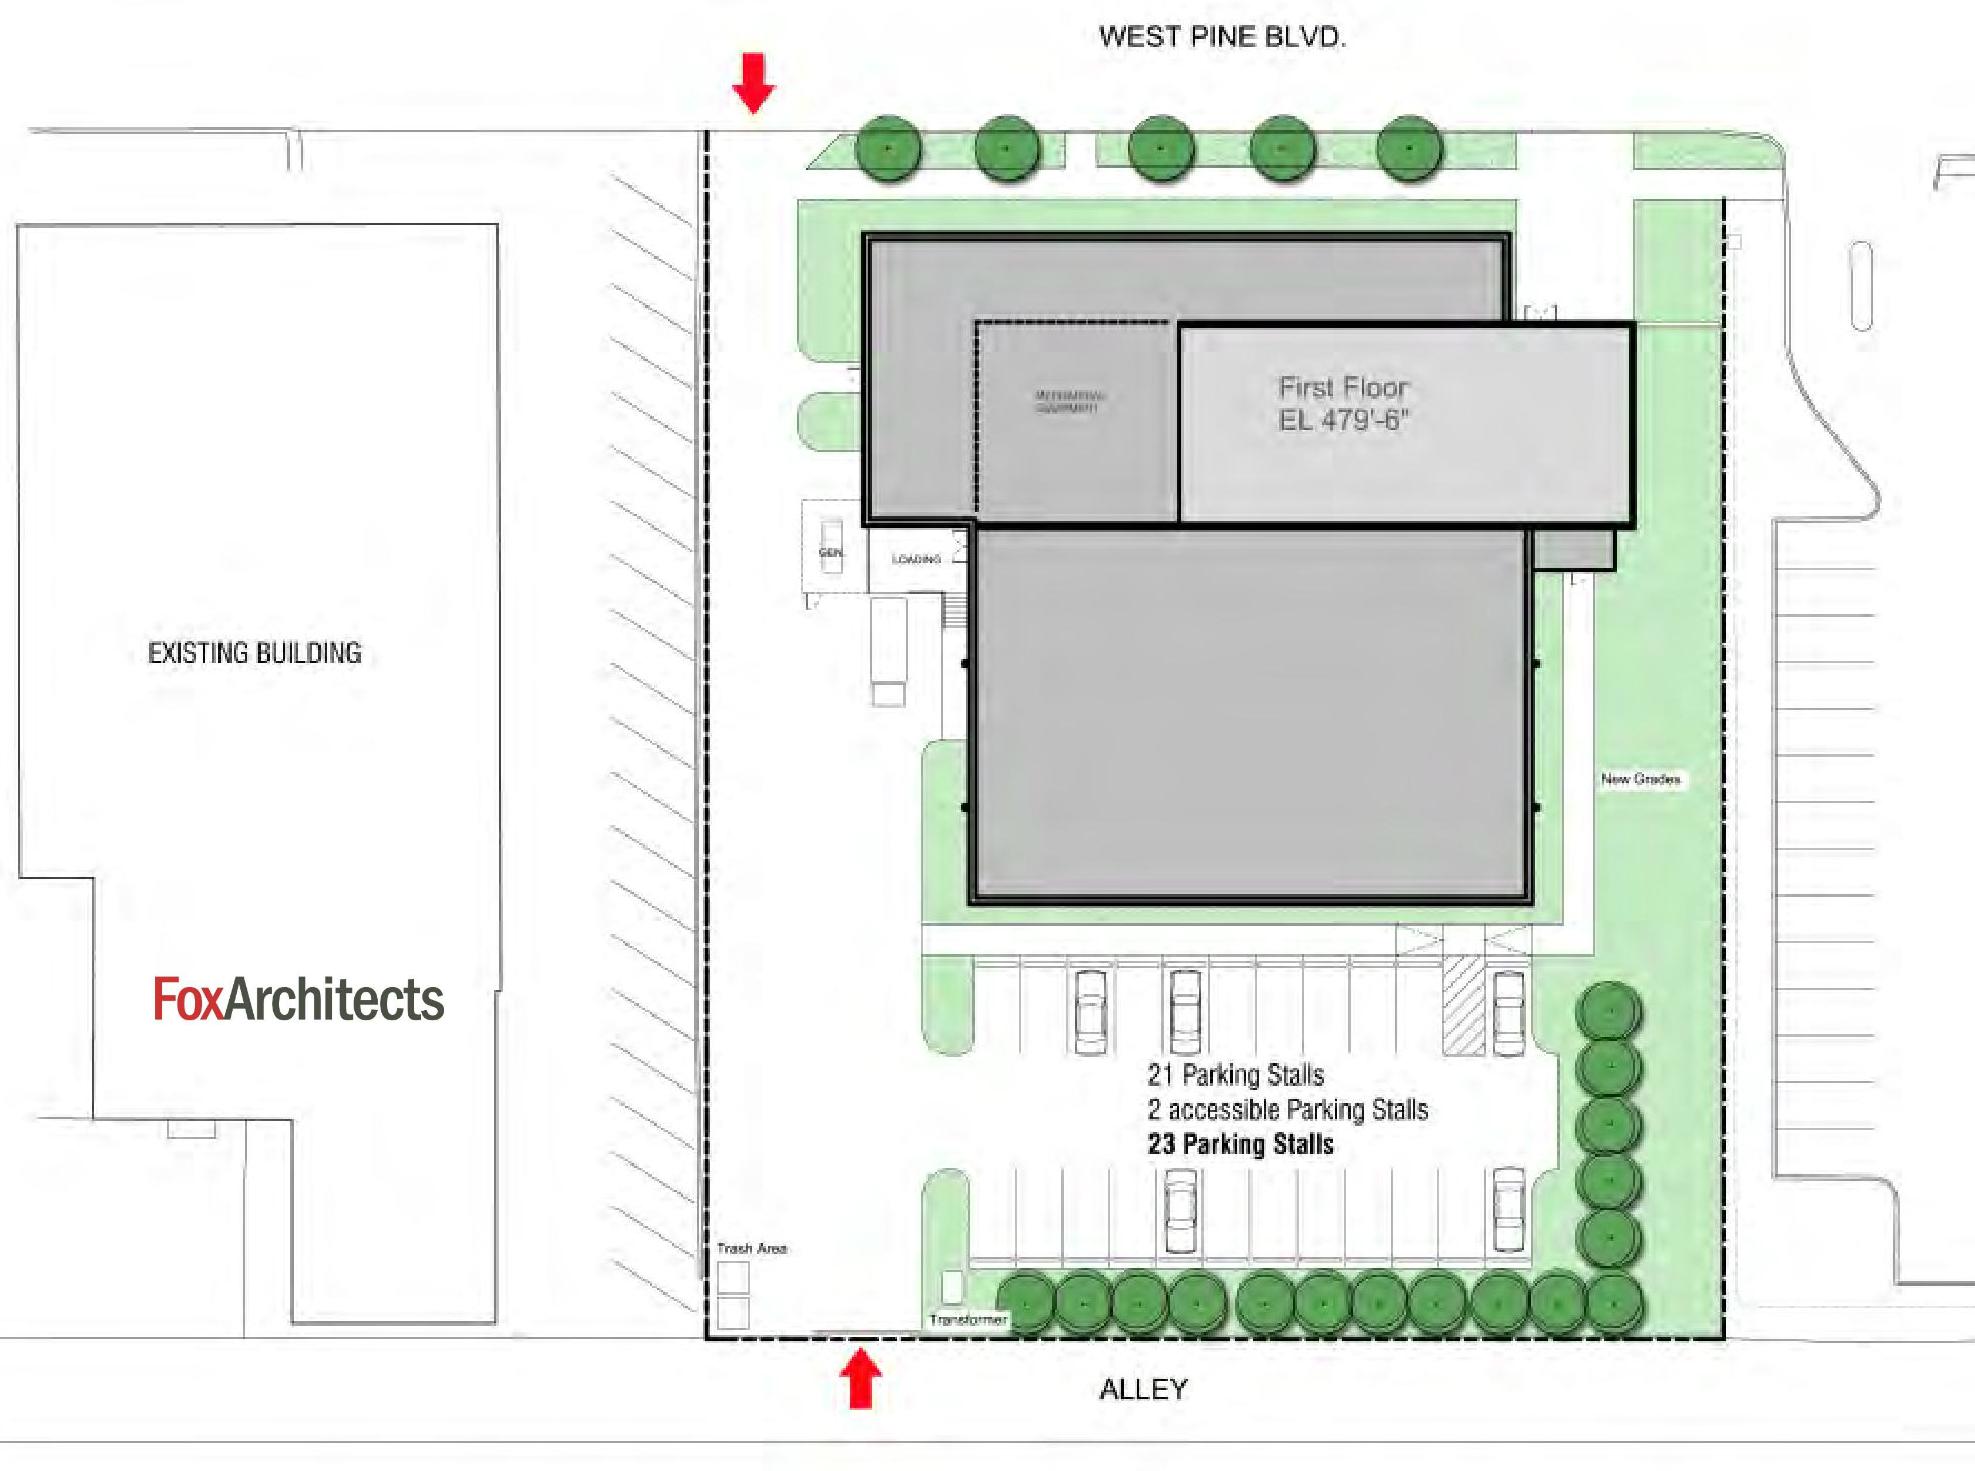 3920 West Pine_site plan